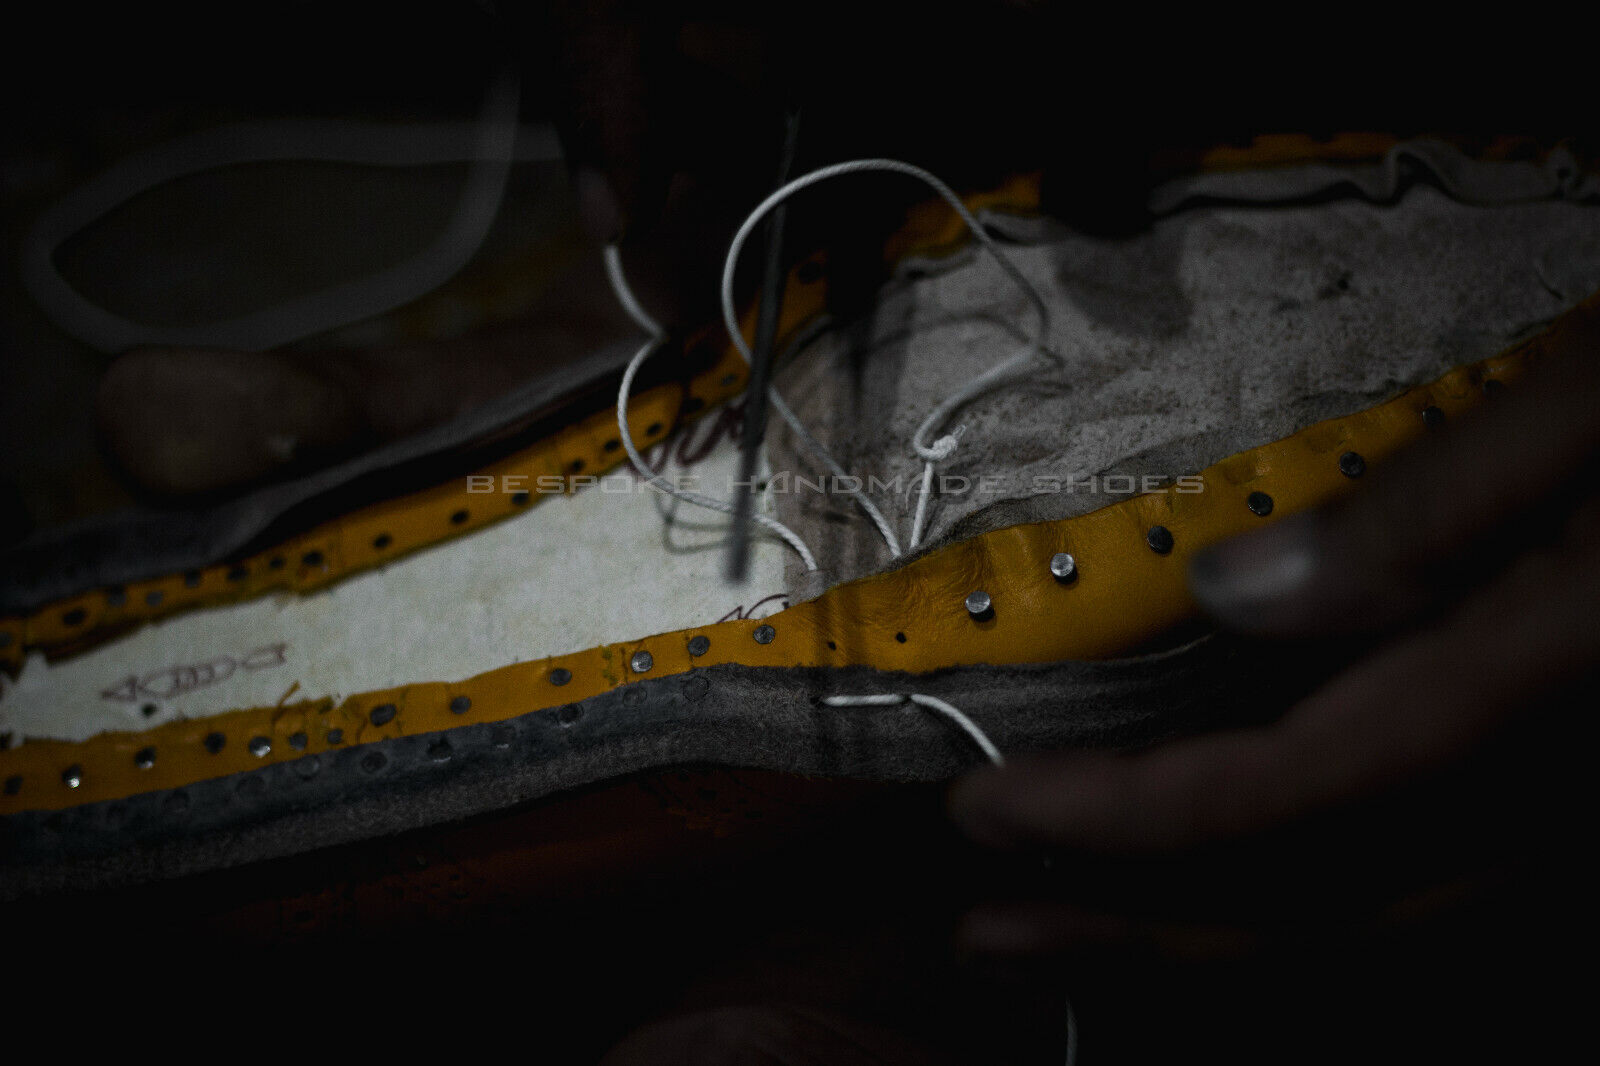 Handgemachte brogue oxford wingtip echte Lederschuhe Lederschuhe Lederschuhe für Männer d6ed8e